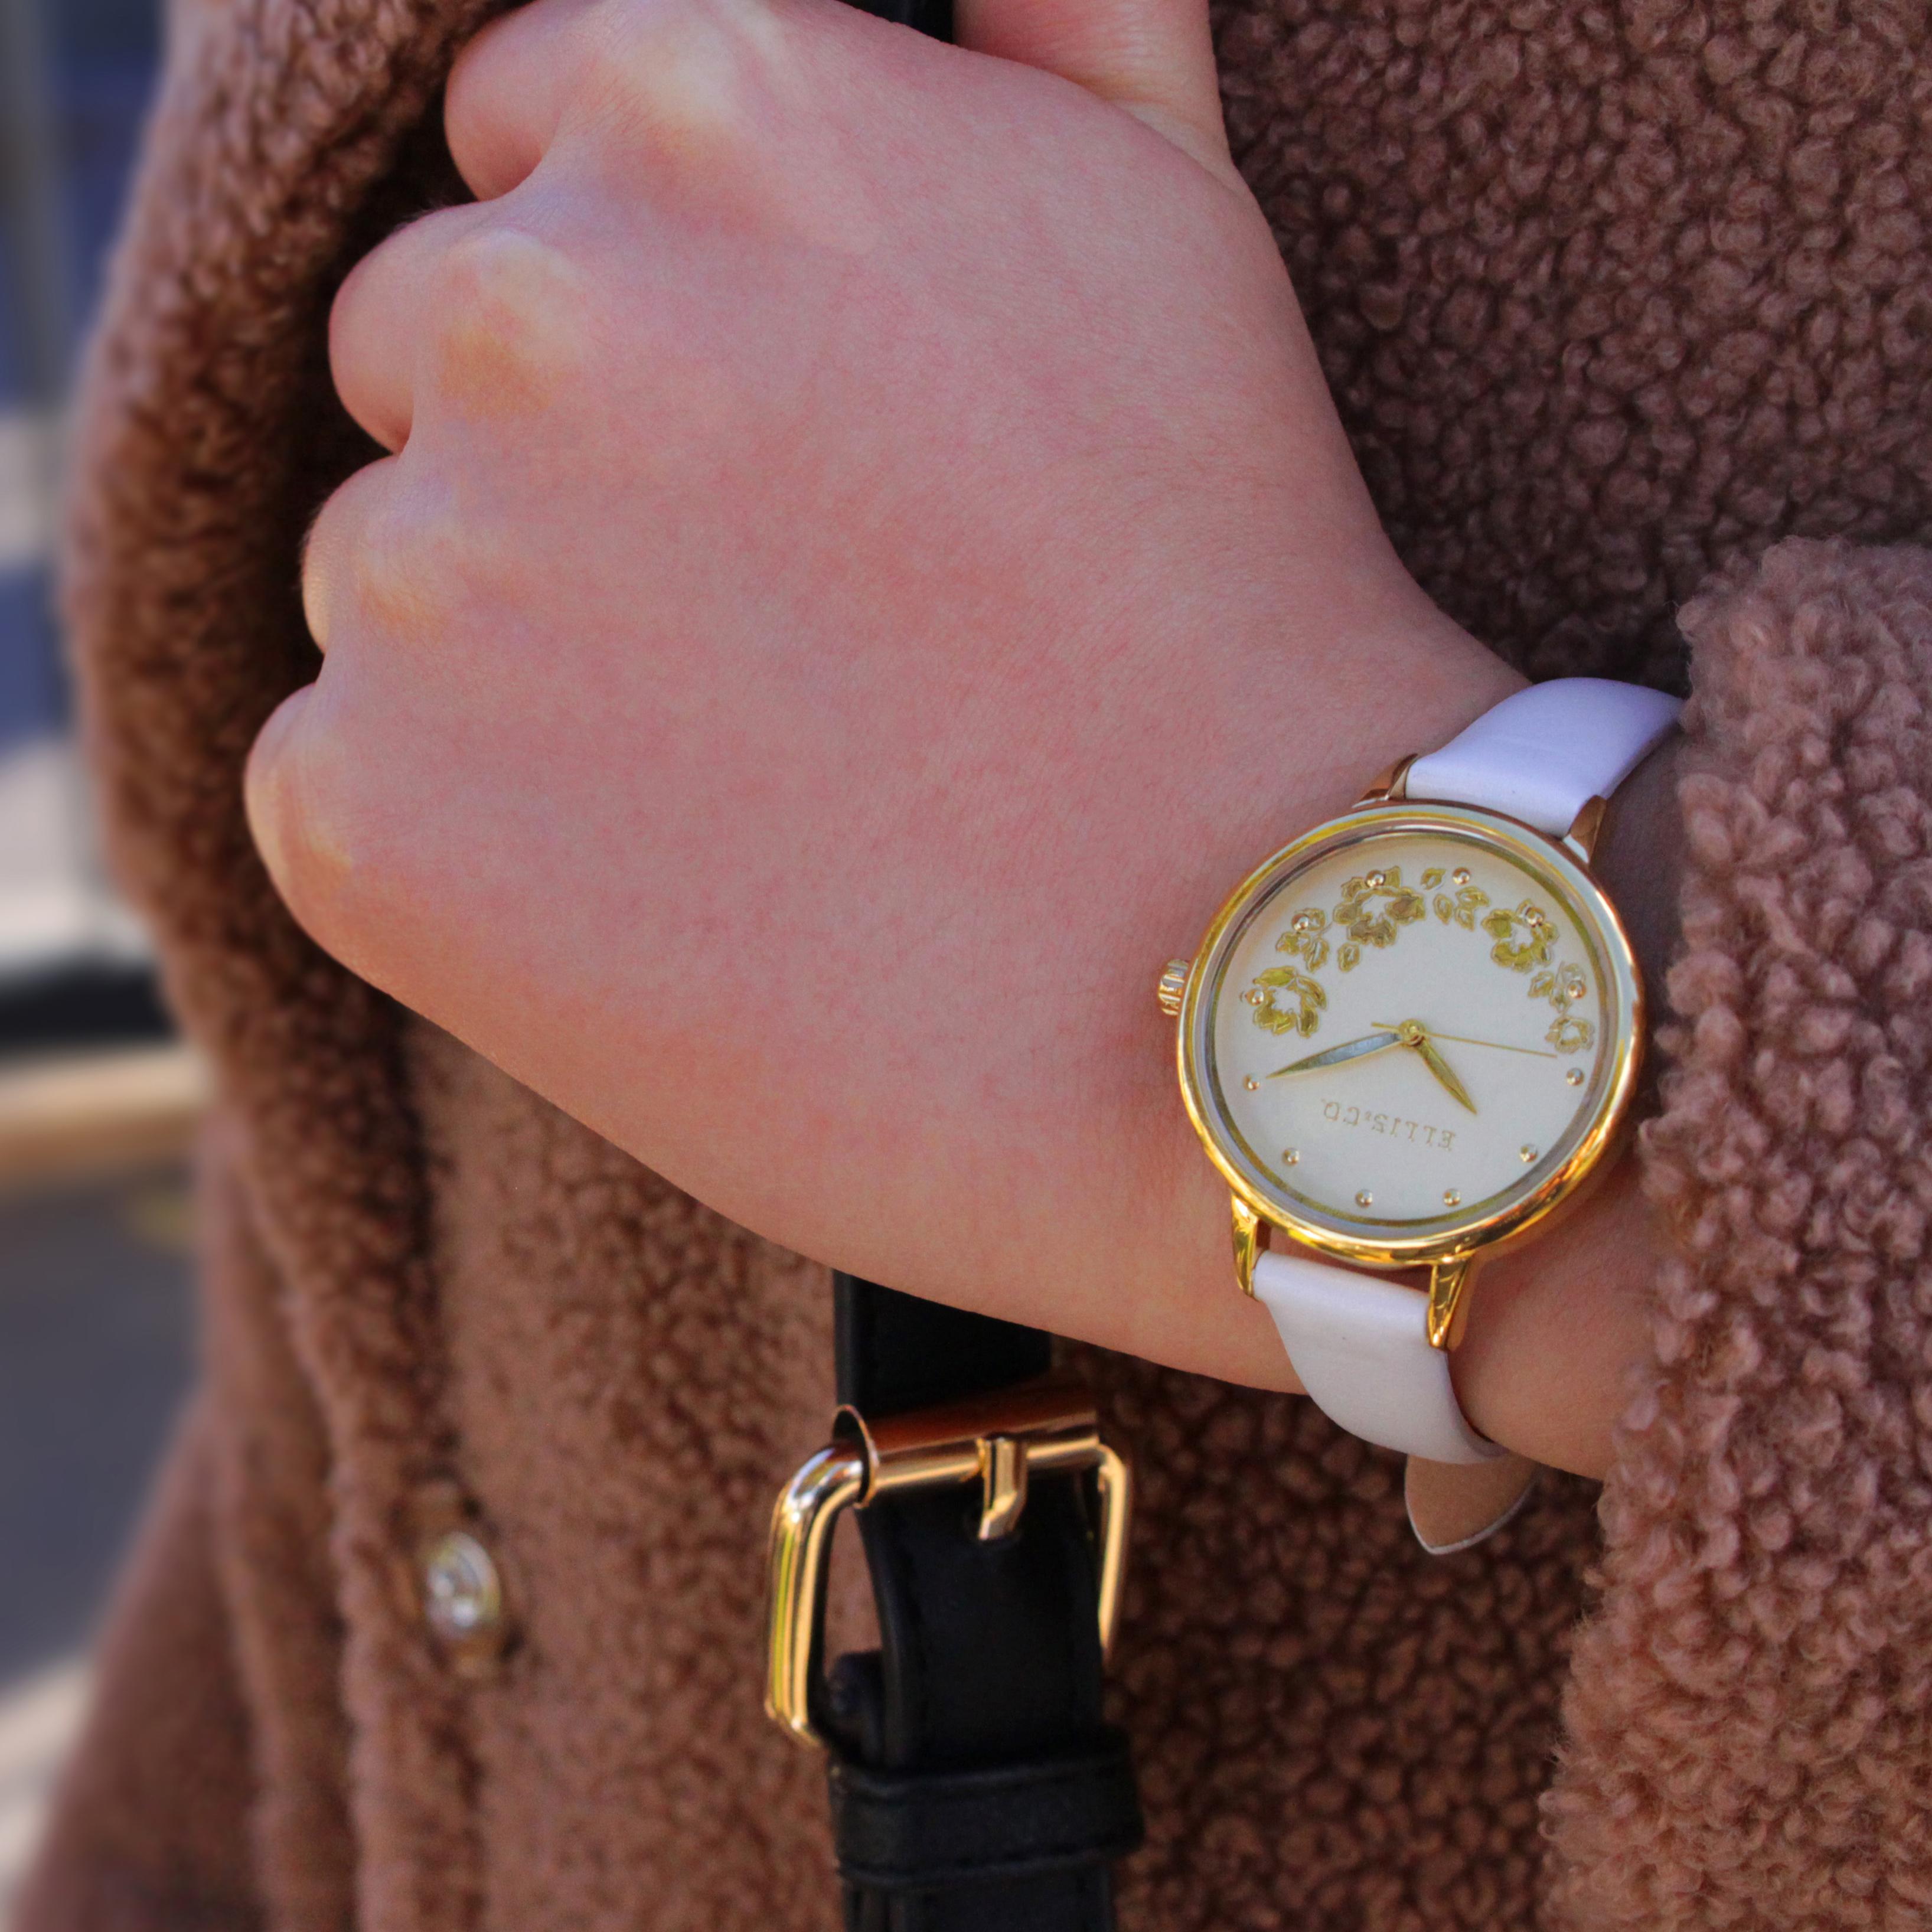 Ellis & Co White Leather Womens Watch